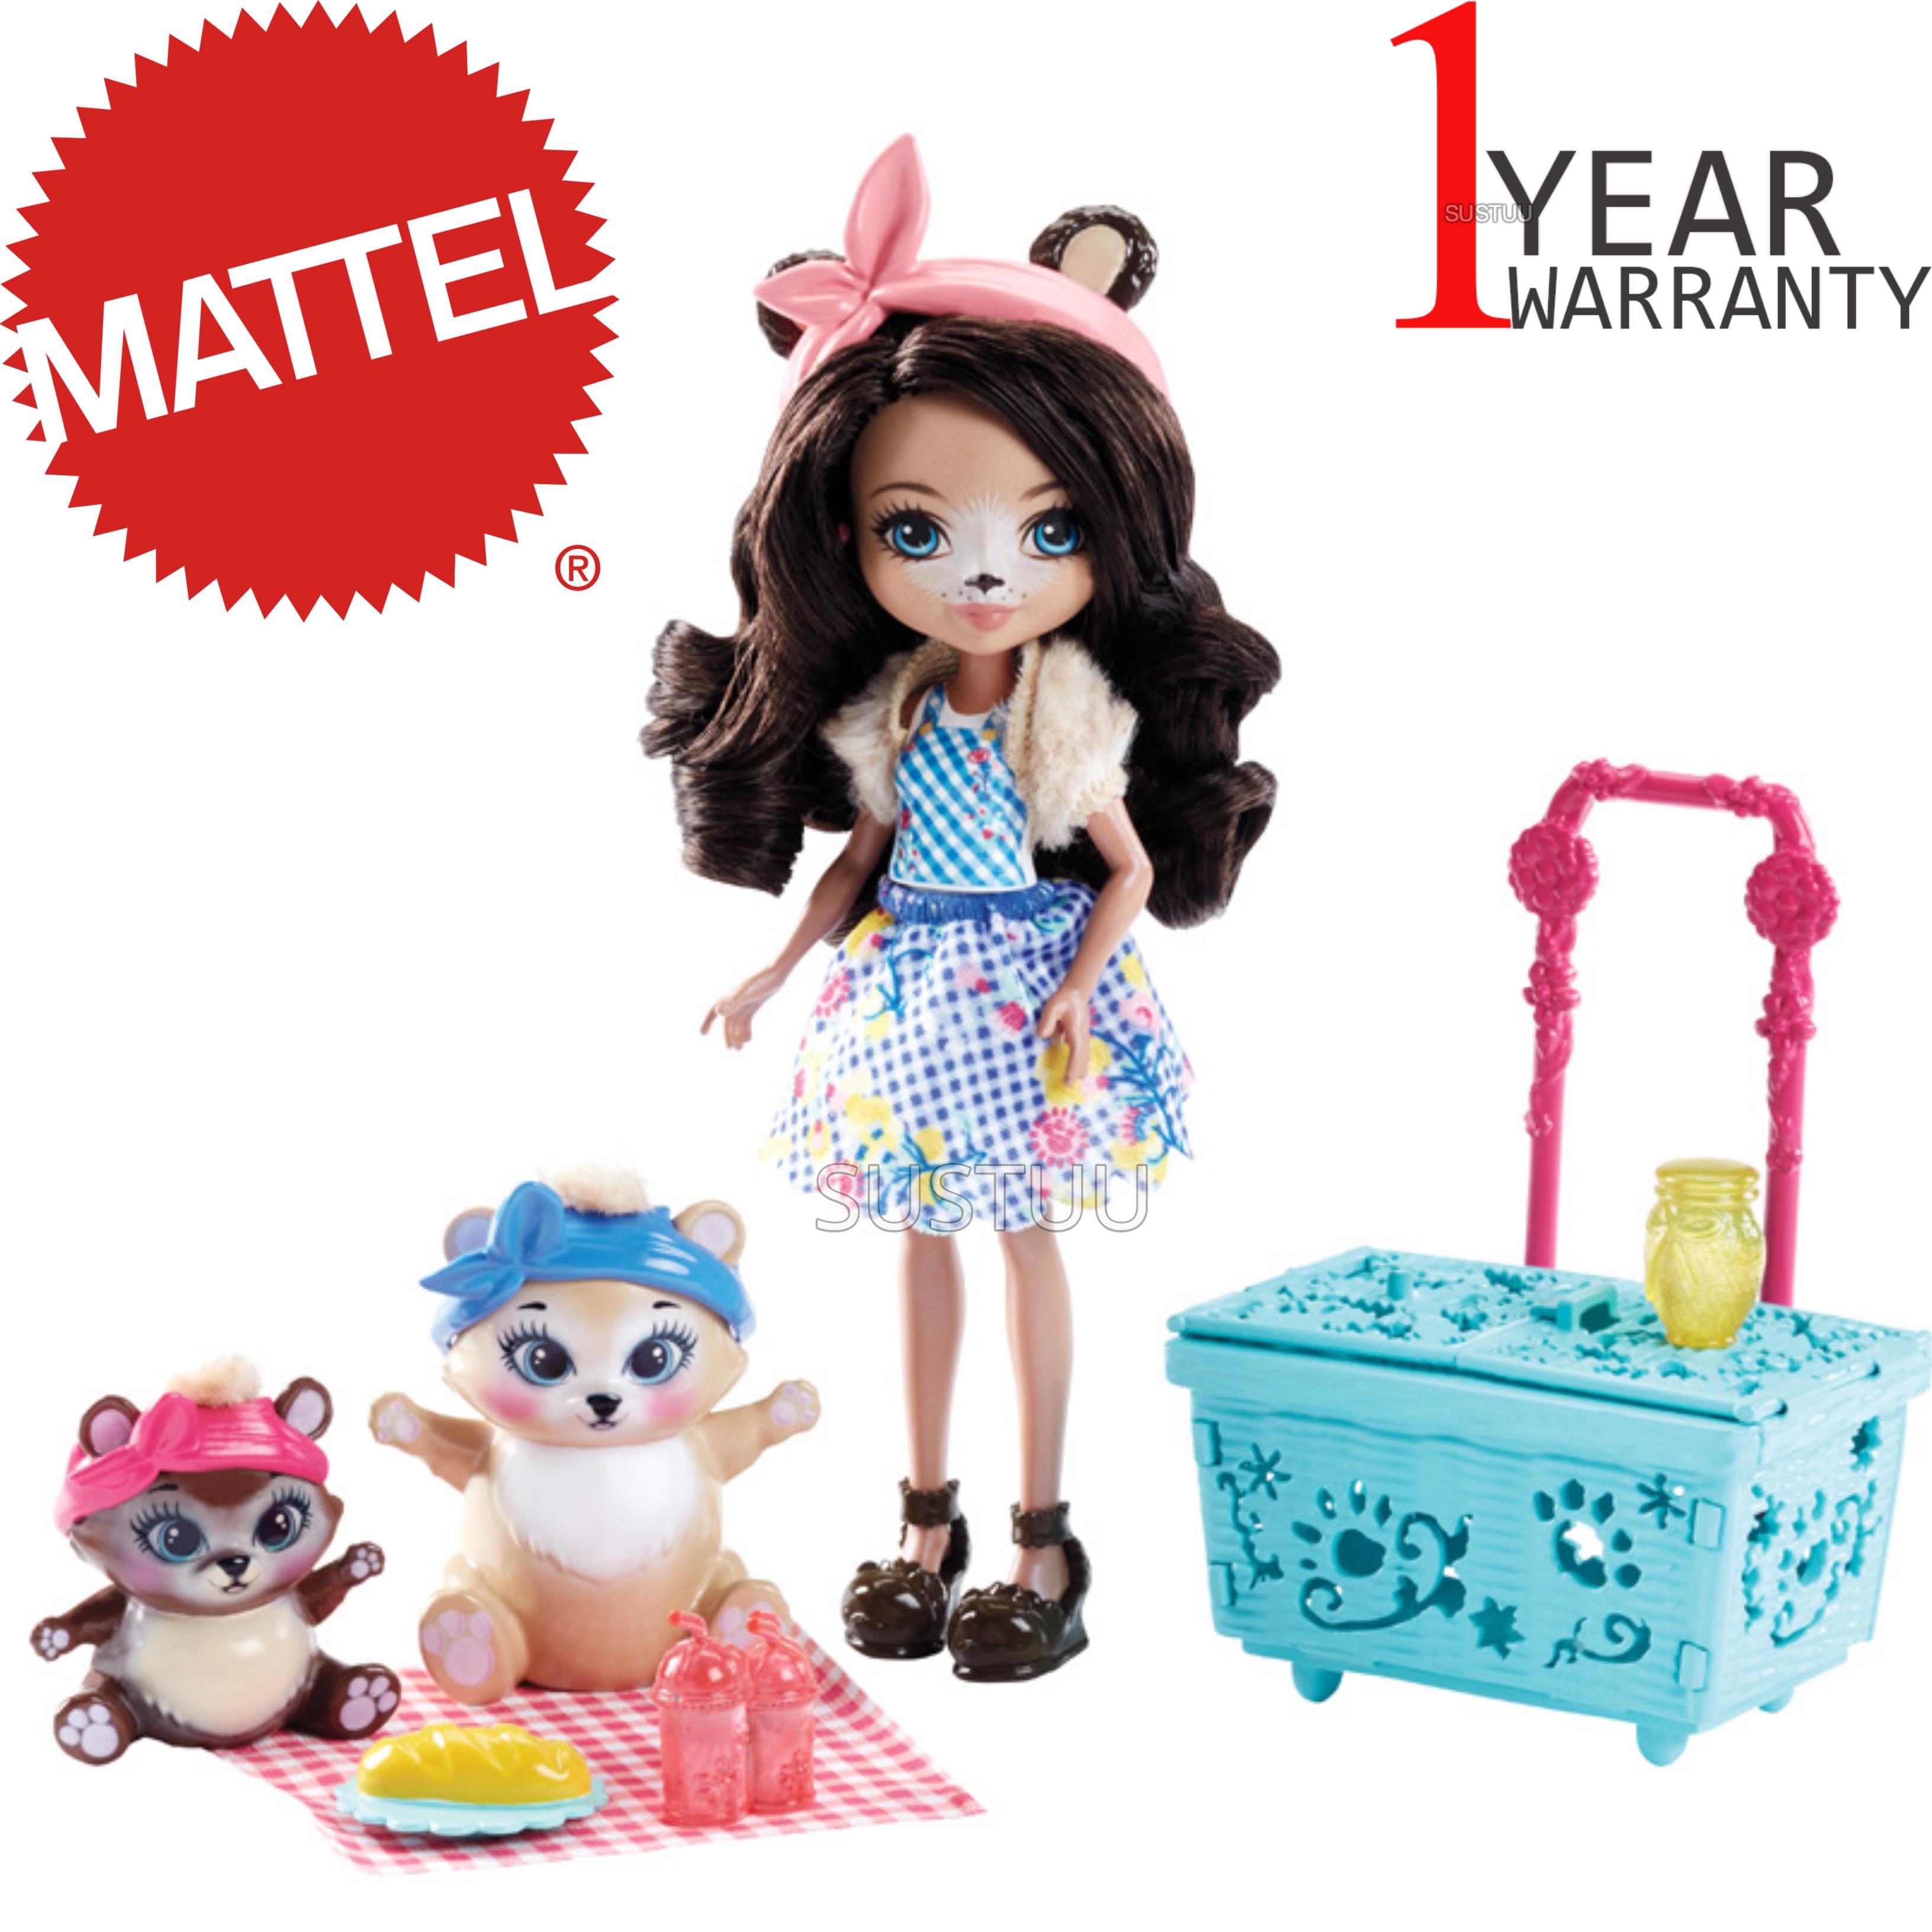 Enchantimals Playset Bear Picnic   Baby/ Kid's Antique Fun/ Playtime Toy   +3 Years